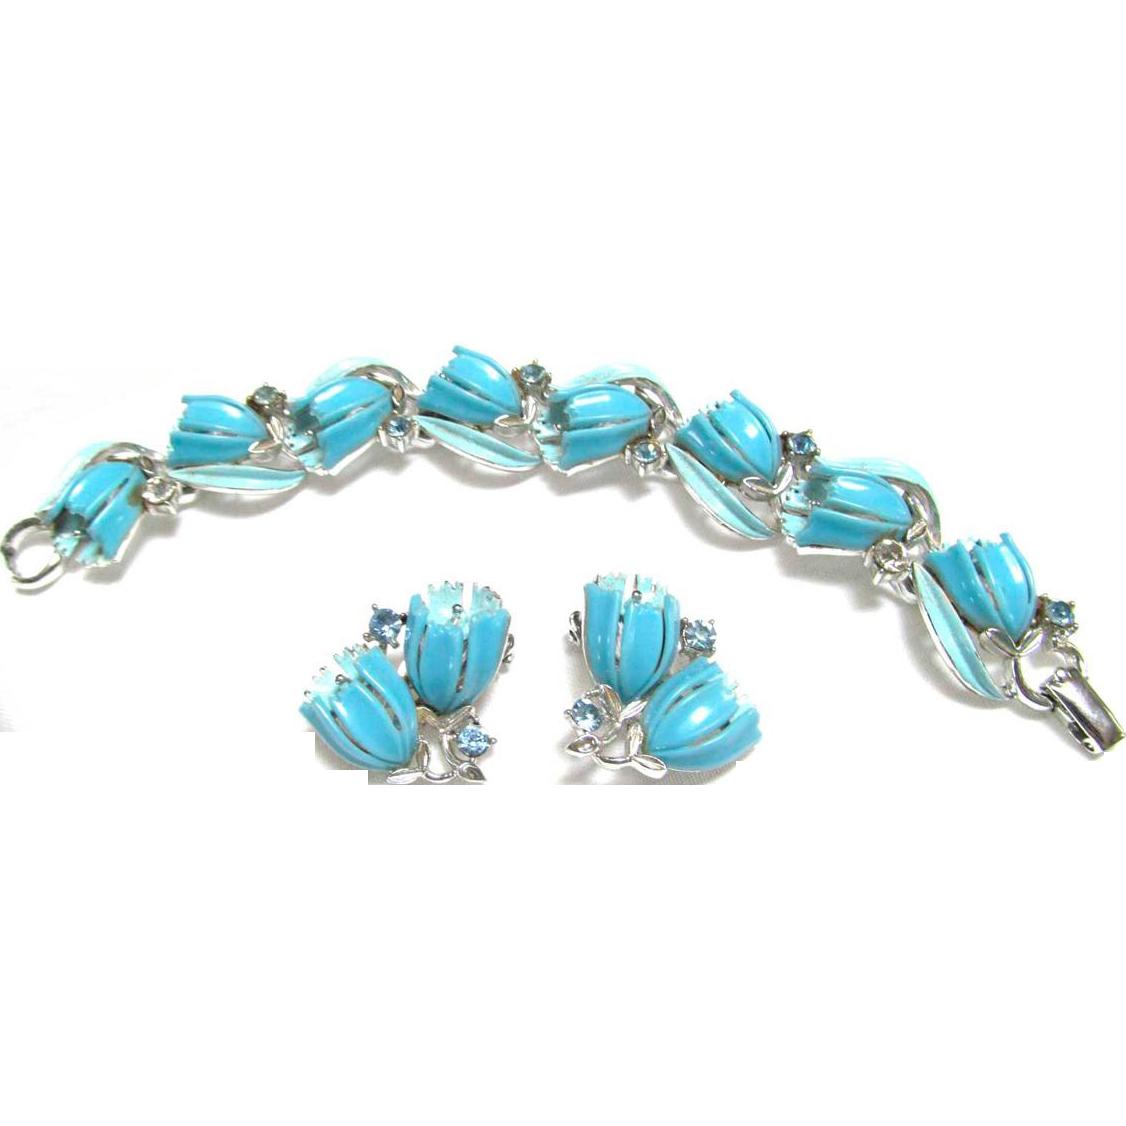 Vintage Lisner Plastic Set Bracelet Clip Earrings Blue Flowers